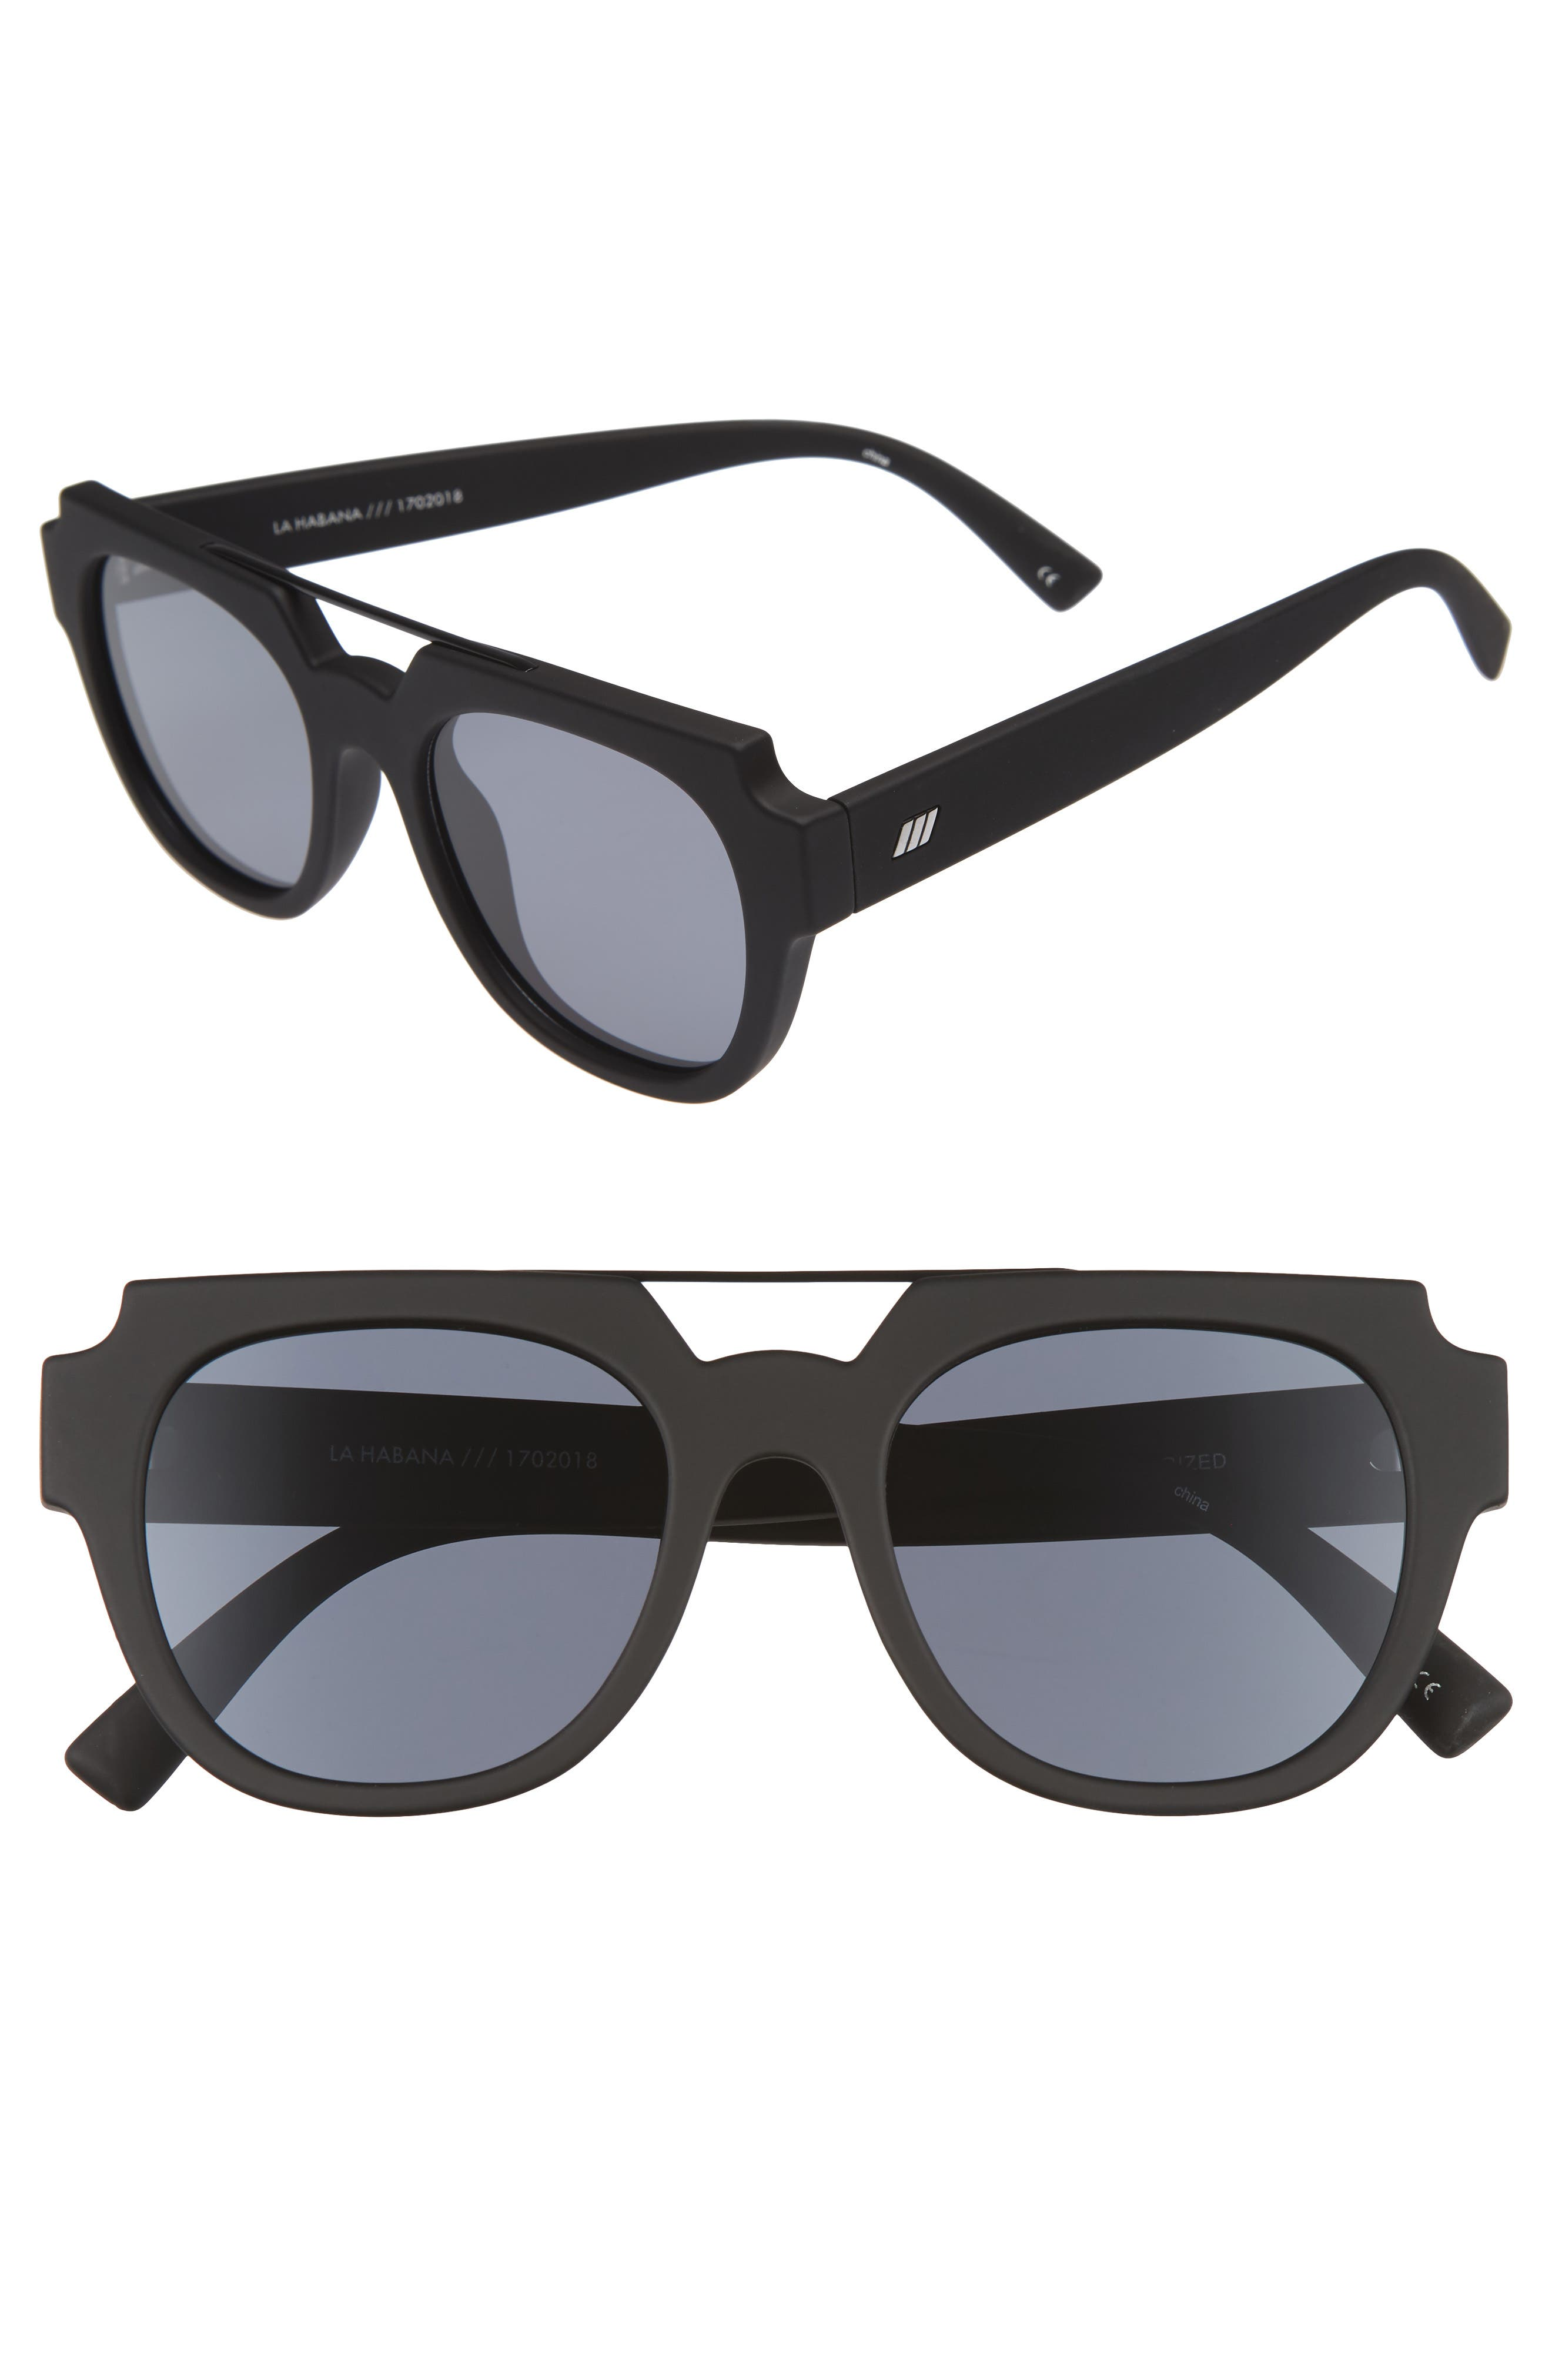 La Habana 52mm Retro Sunglasses,                             Main thumbnail 1, color,                             001